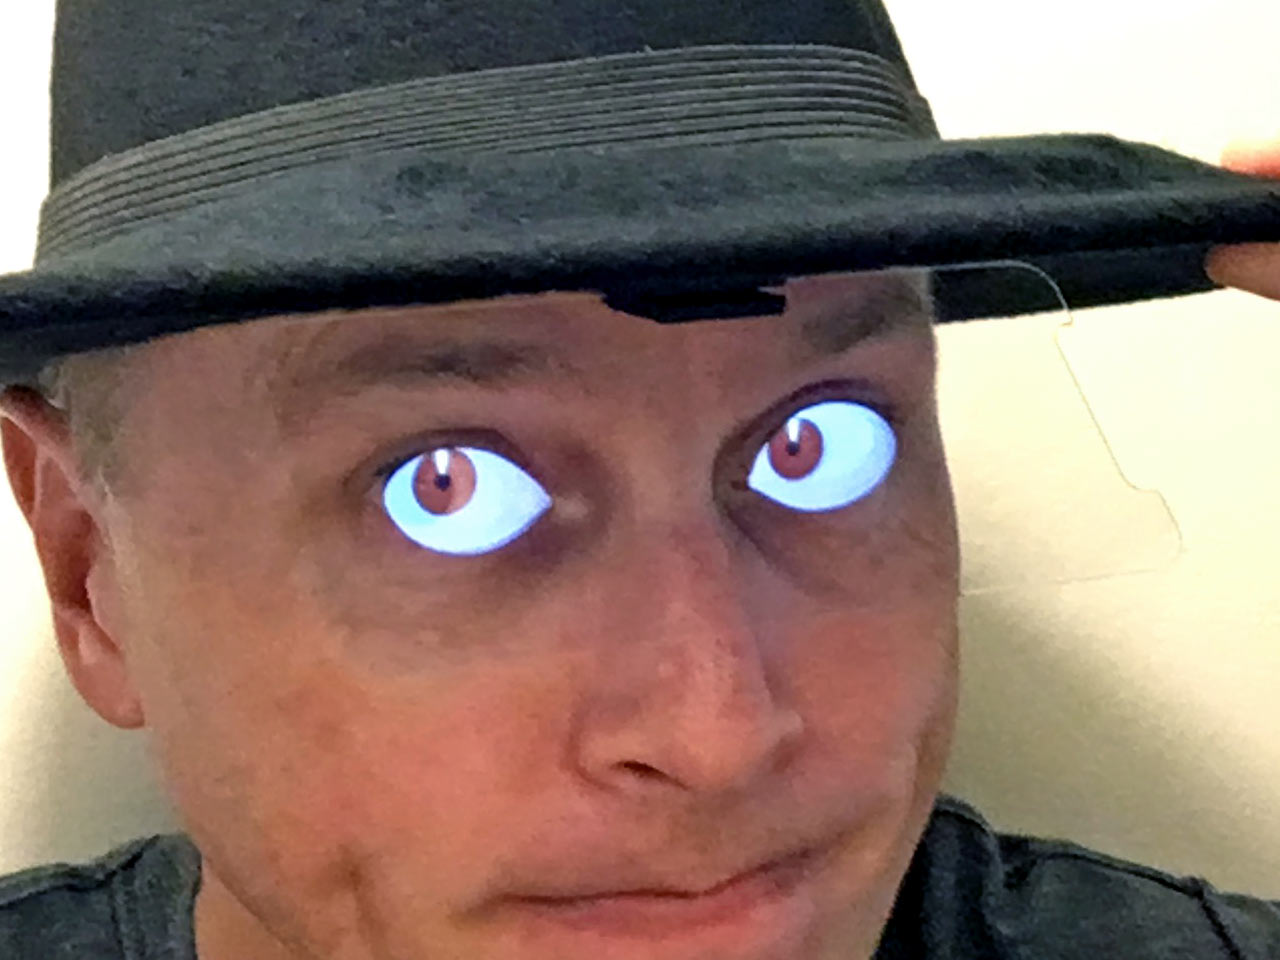 wearables_eyes-red.jpg